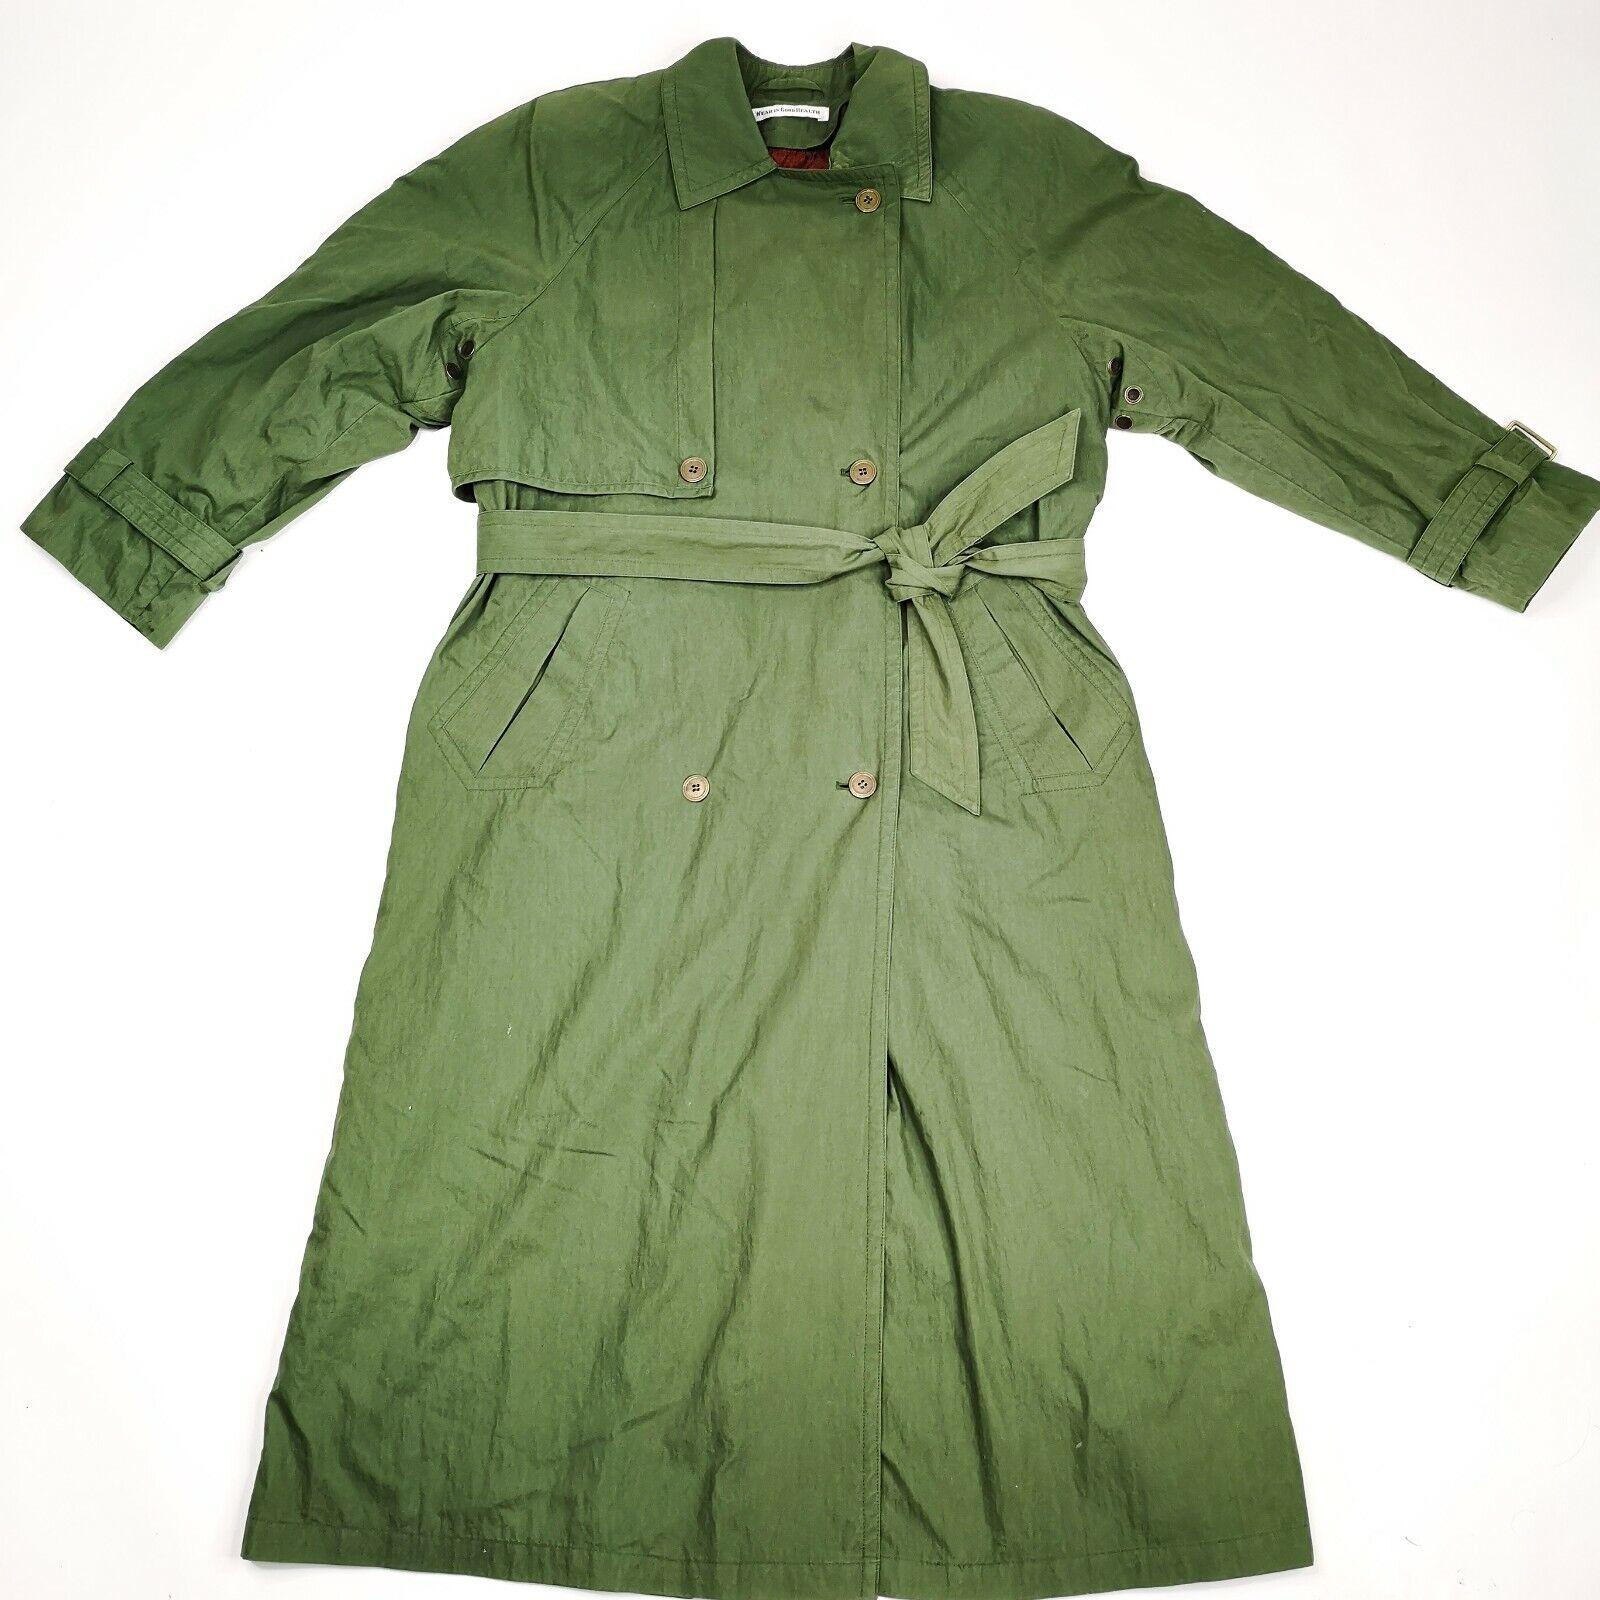 MISTY HARBOR Trench Coat Jacket 8 Olive Green - image 1